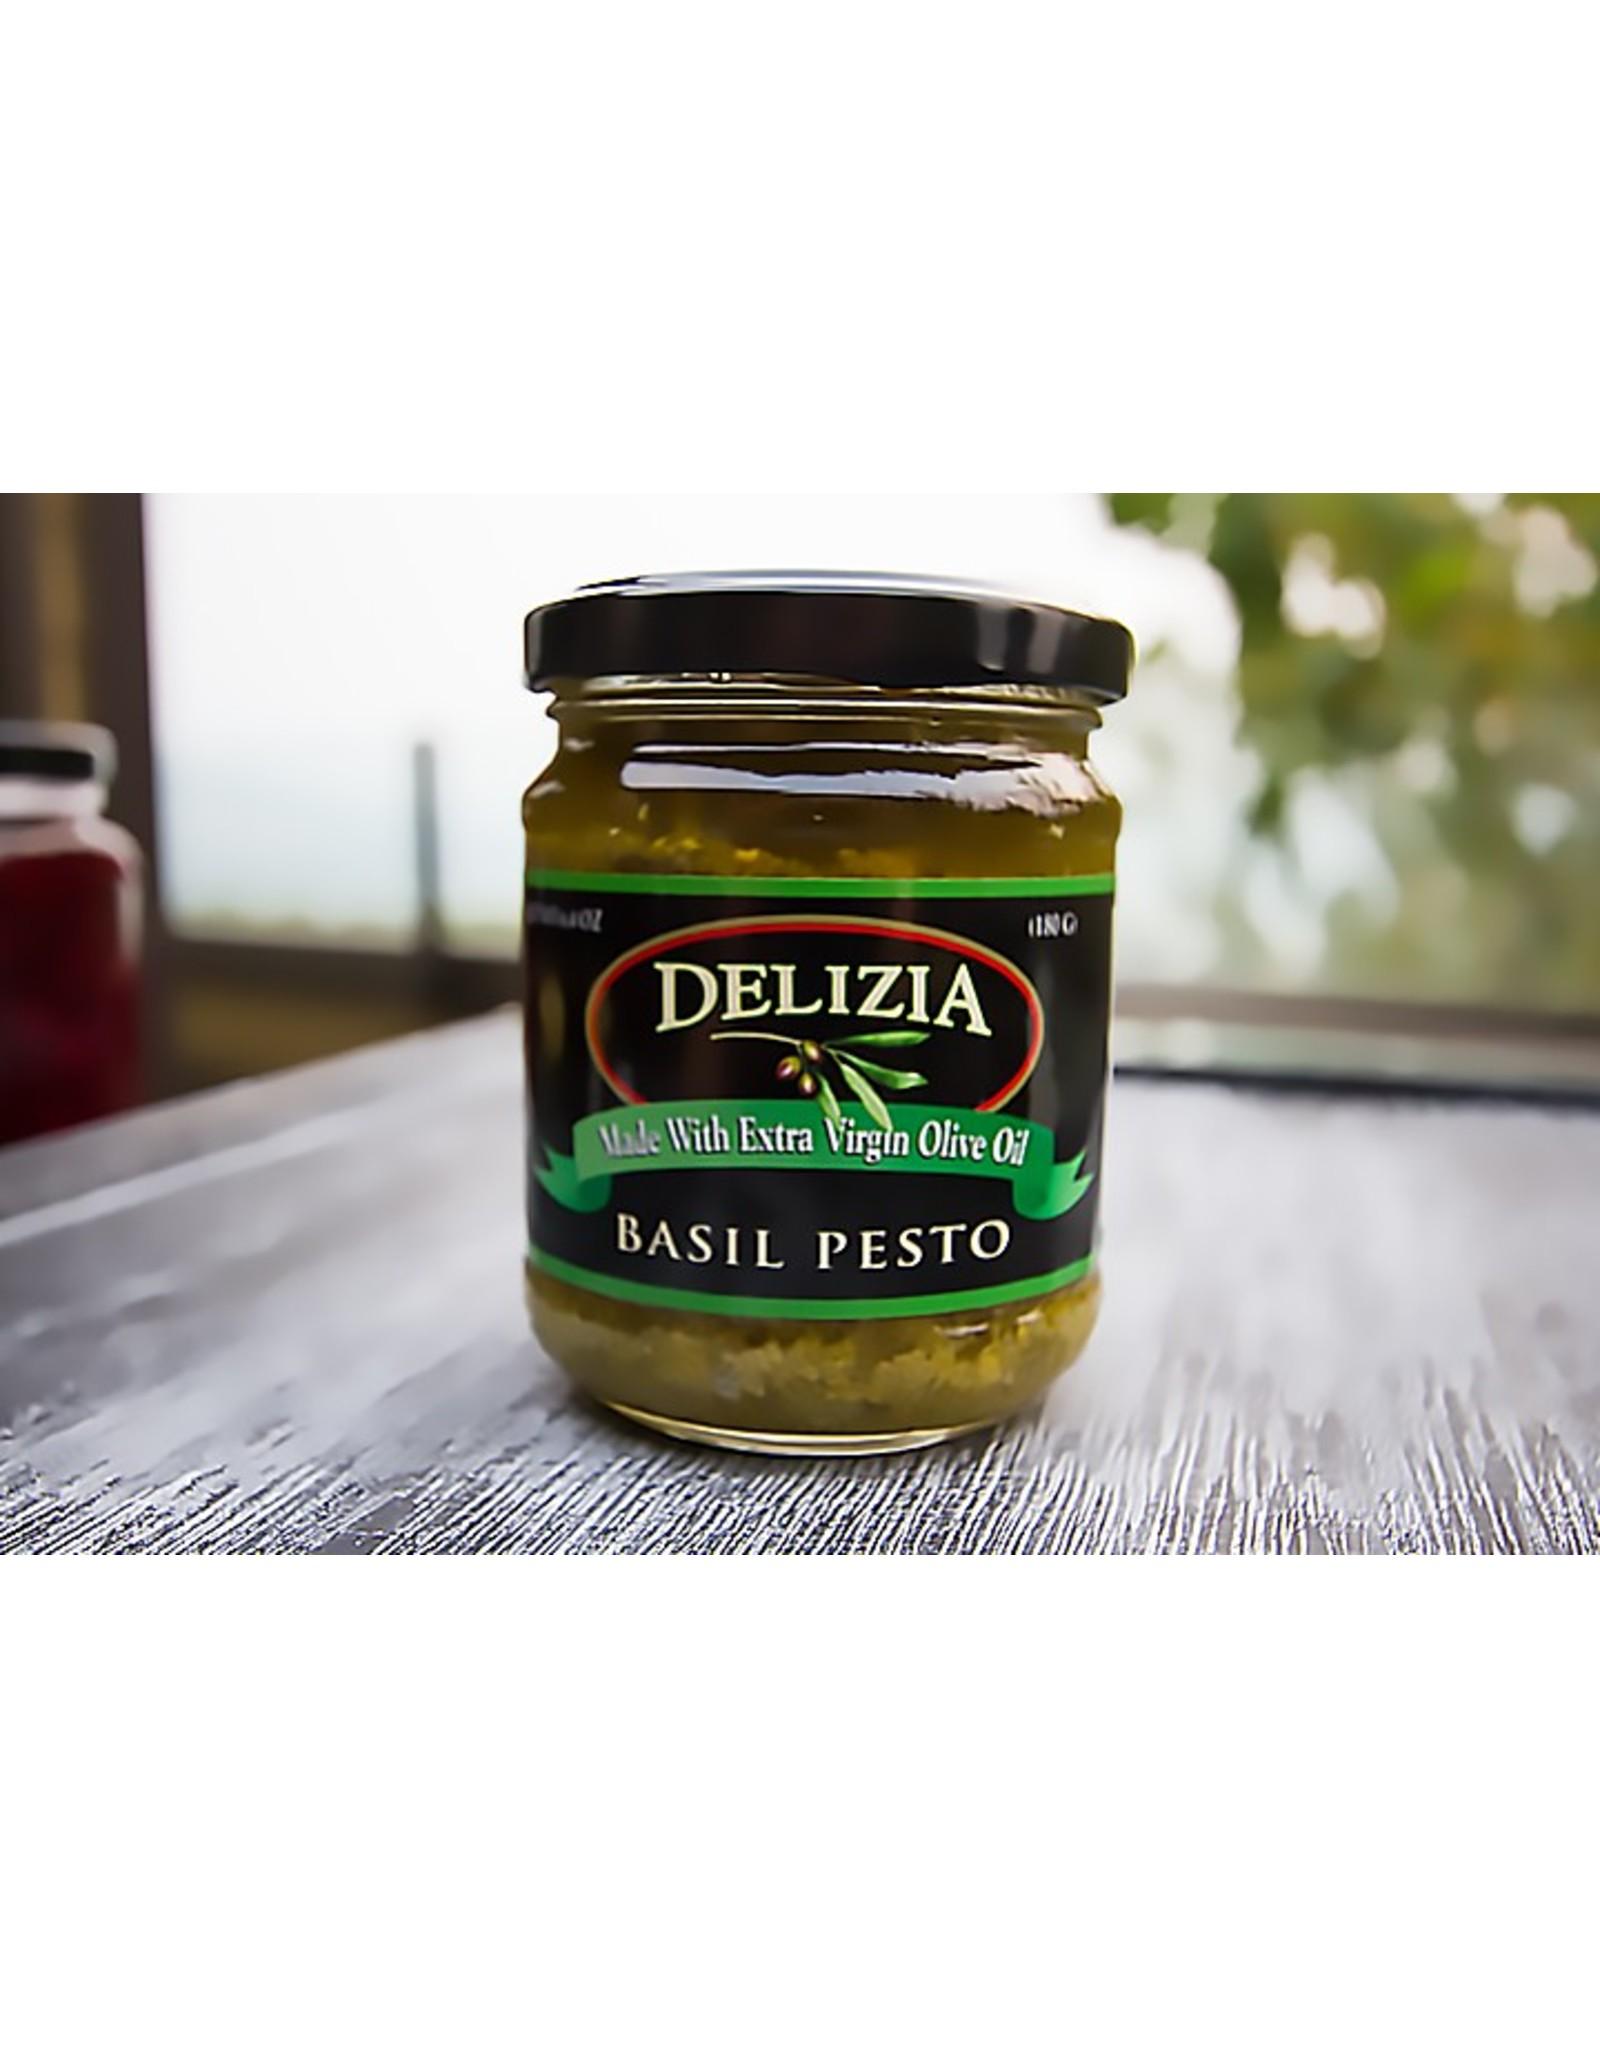 Delizia Delizia Basil Pesto - 6.4oz